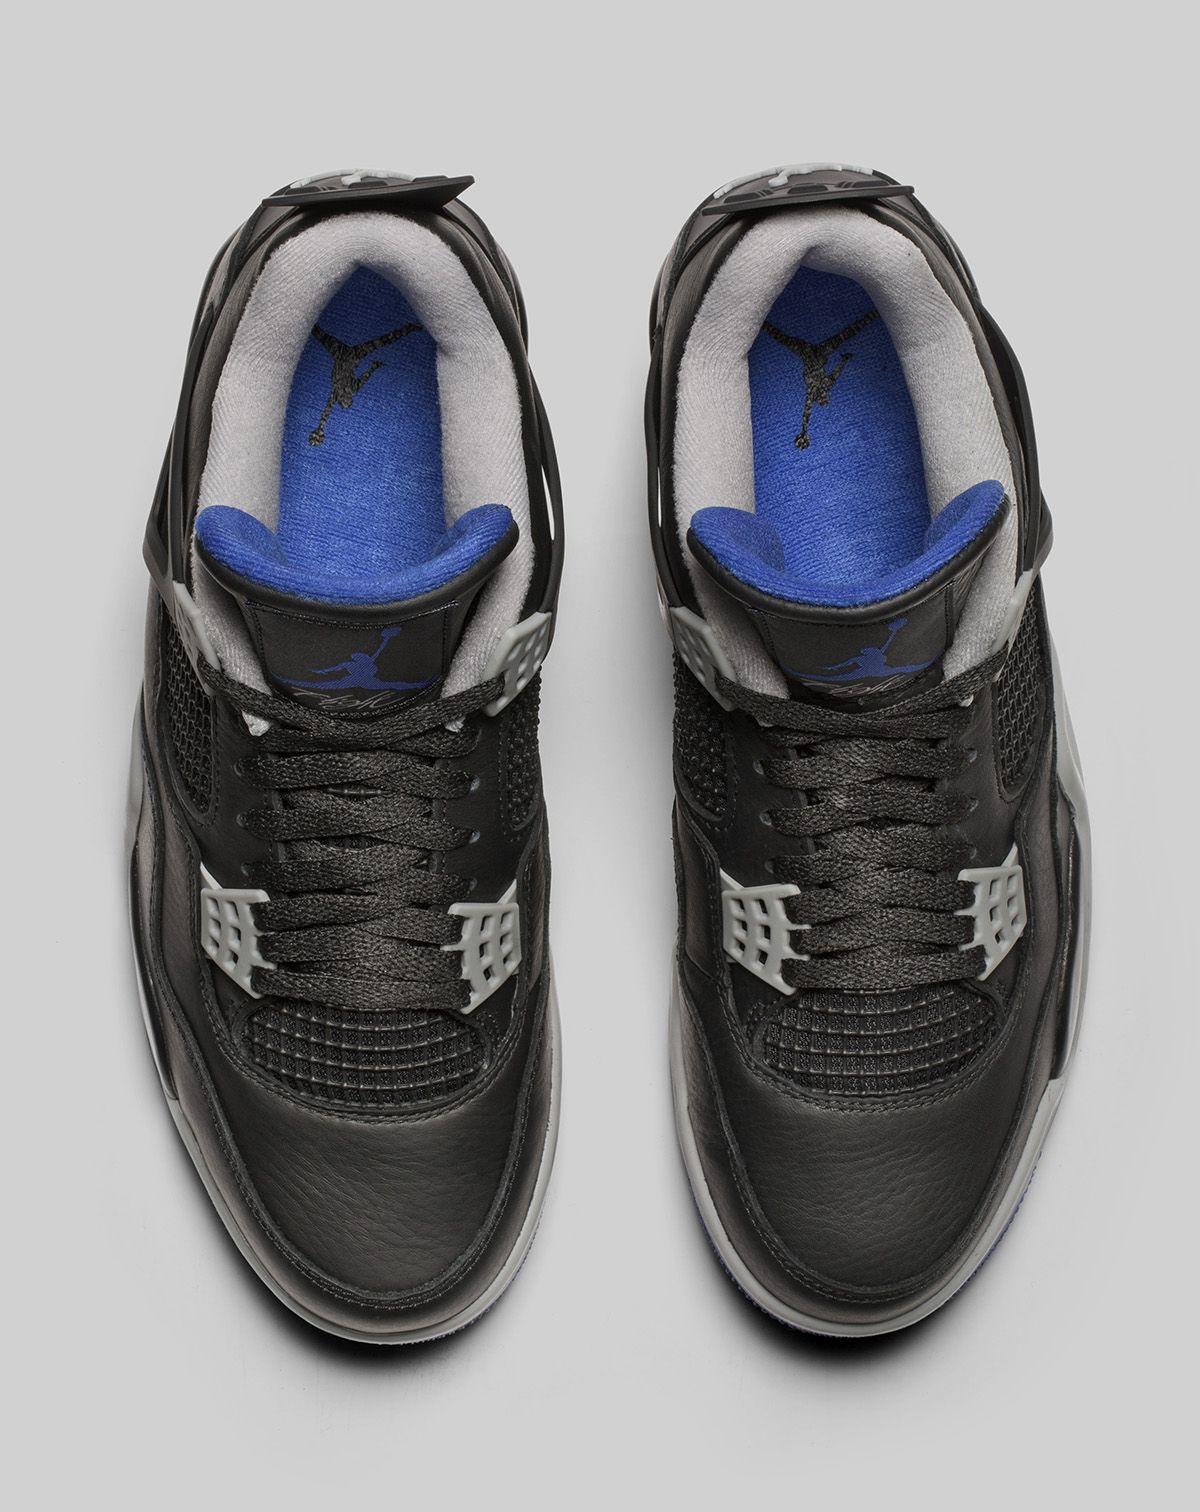 purchase cheap ca4fb bc4ee Preview  Air Jordan 4 Retro  Alternate Motorsport  - EU Kicks  Sneaker  Magazine